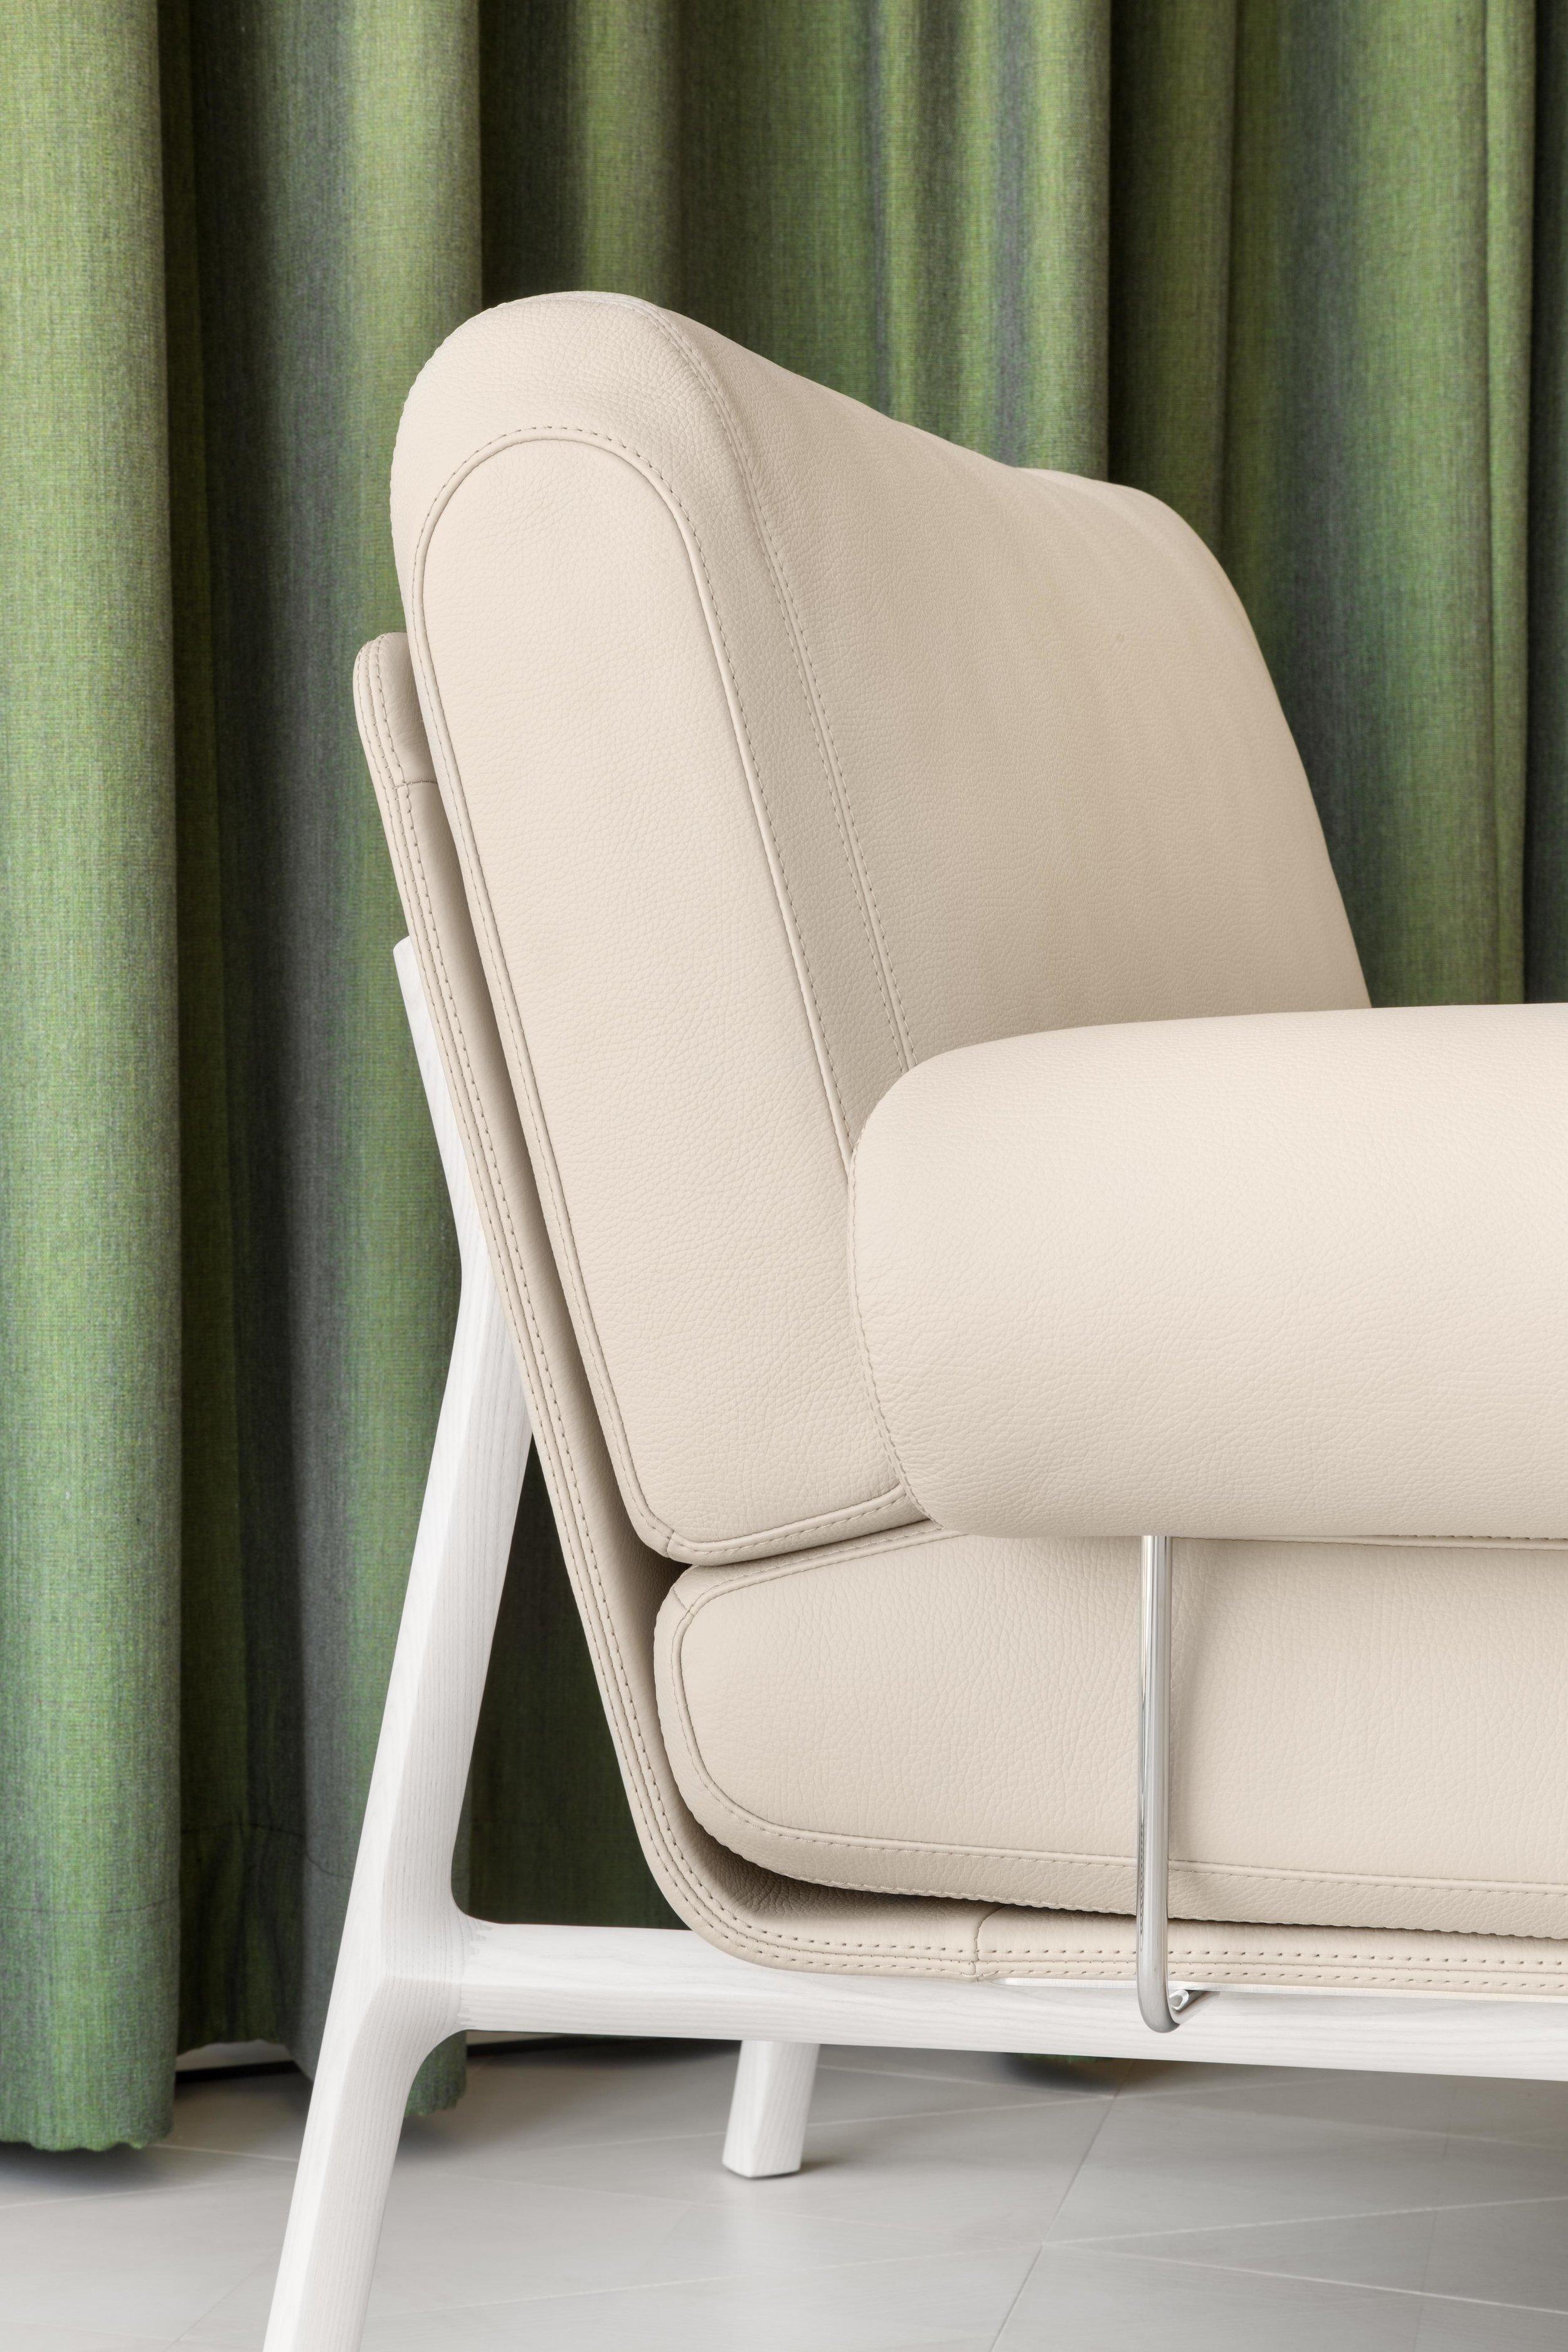 medeo-armchair_furniture-design_coordination-berlin_04.jpg